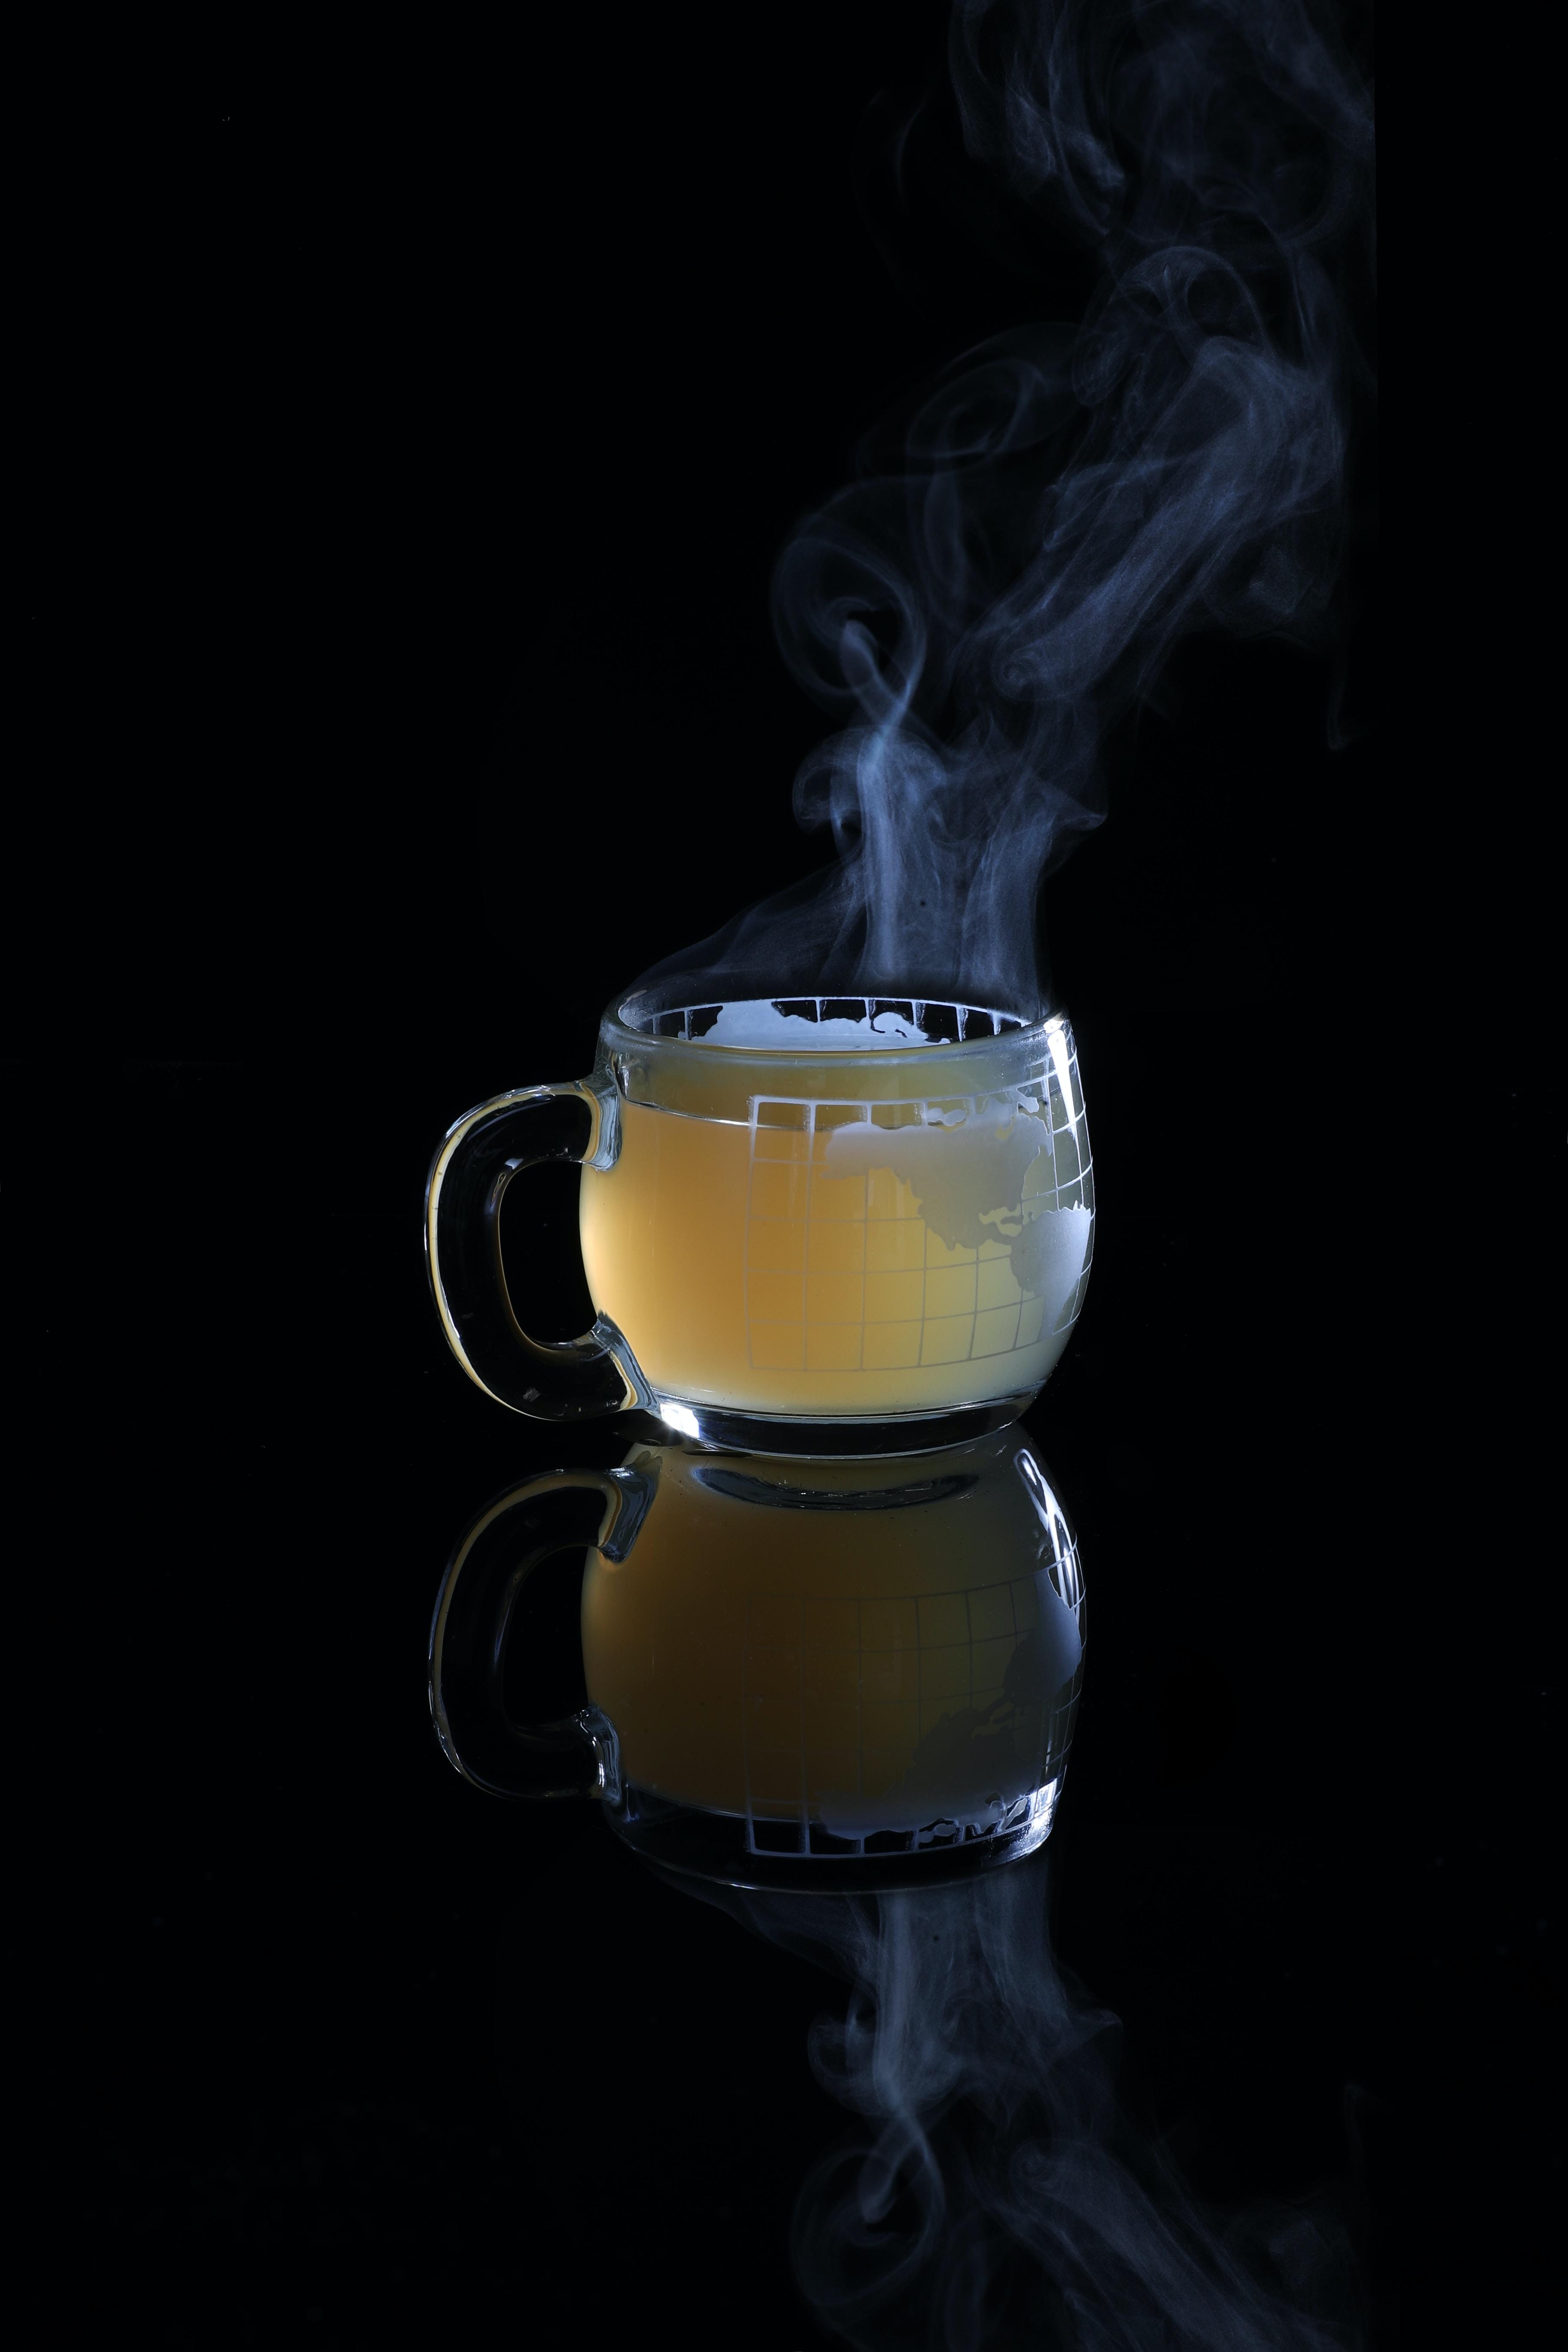 glass mug with hot liquid